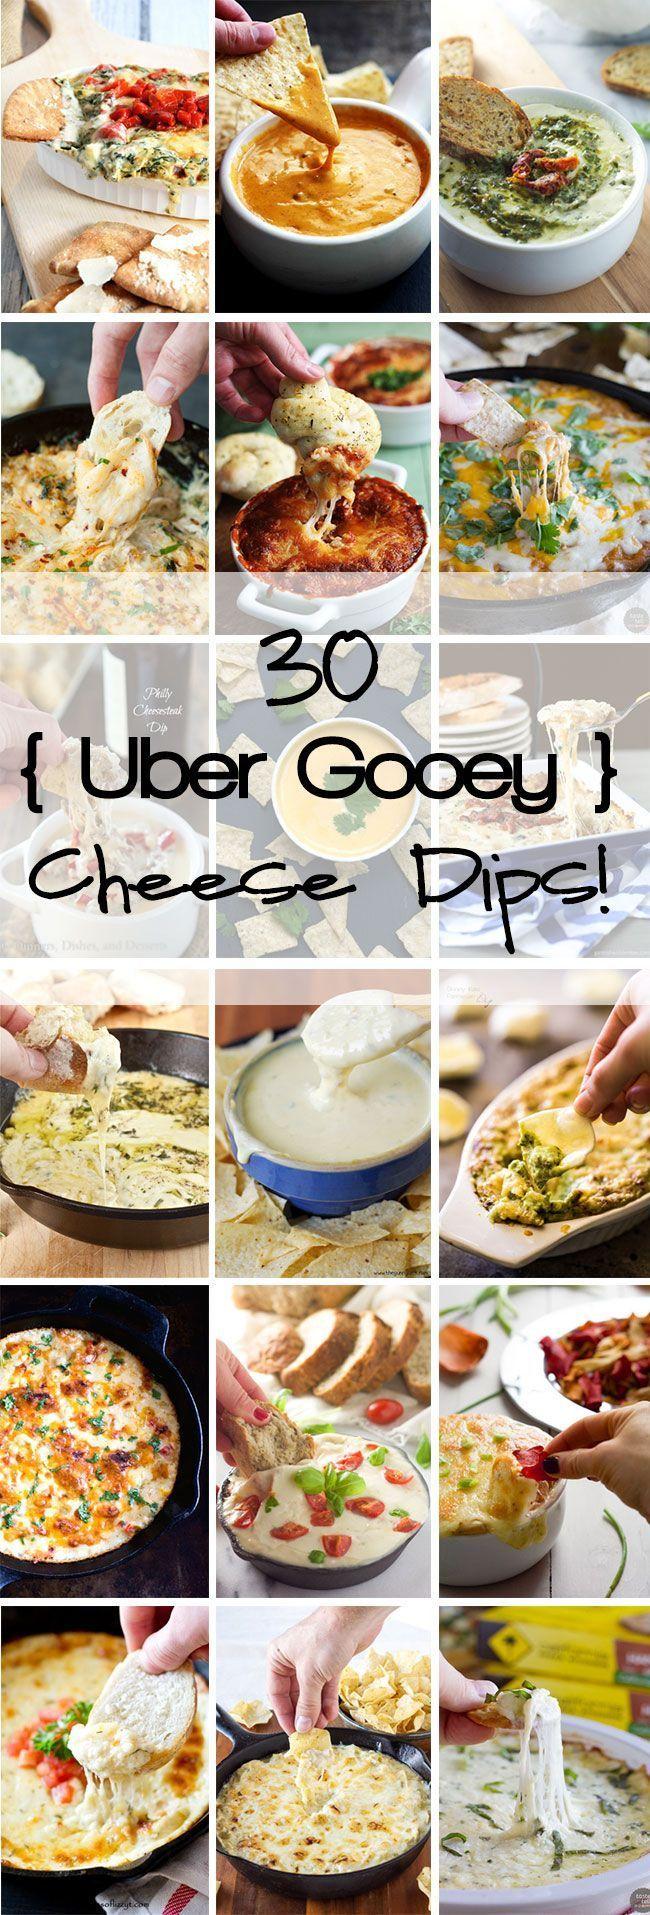 30 Uber Gooey Cheese Dips! Cheese is my love language